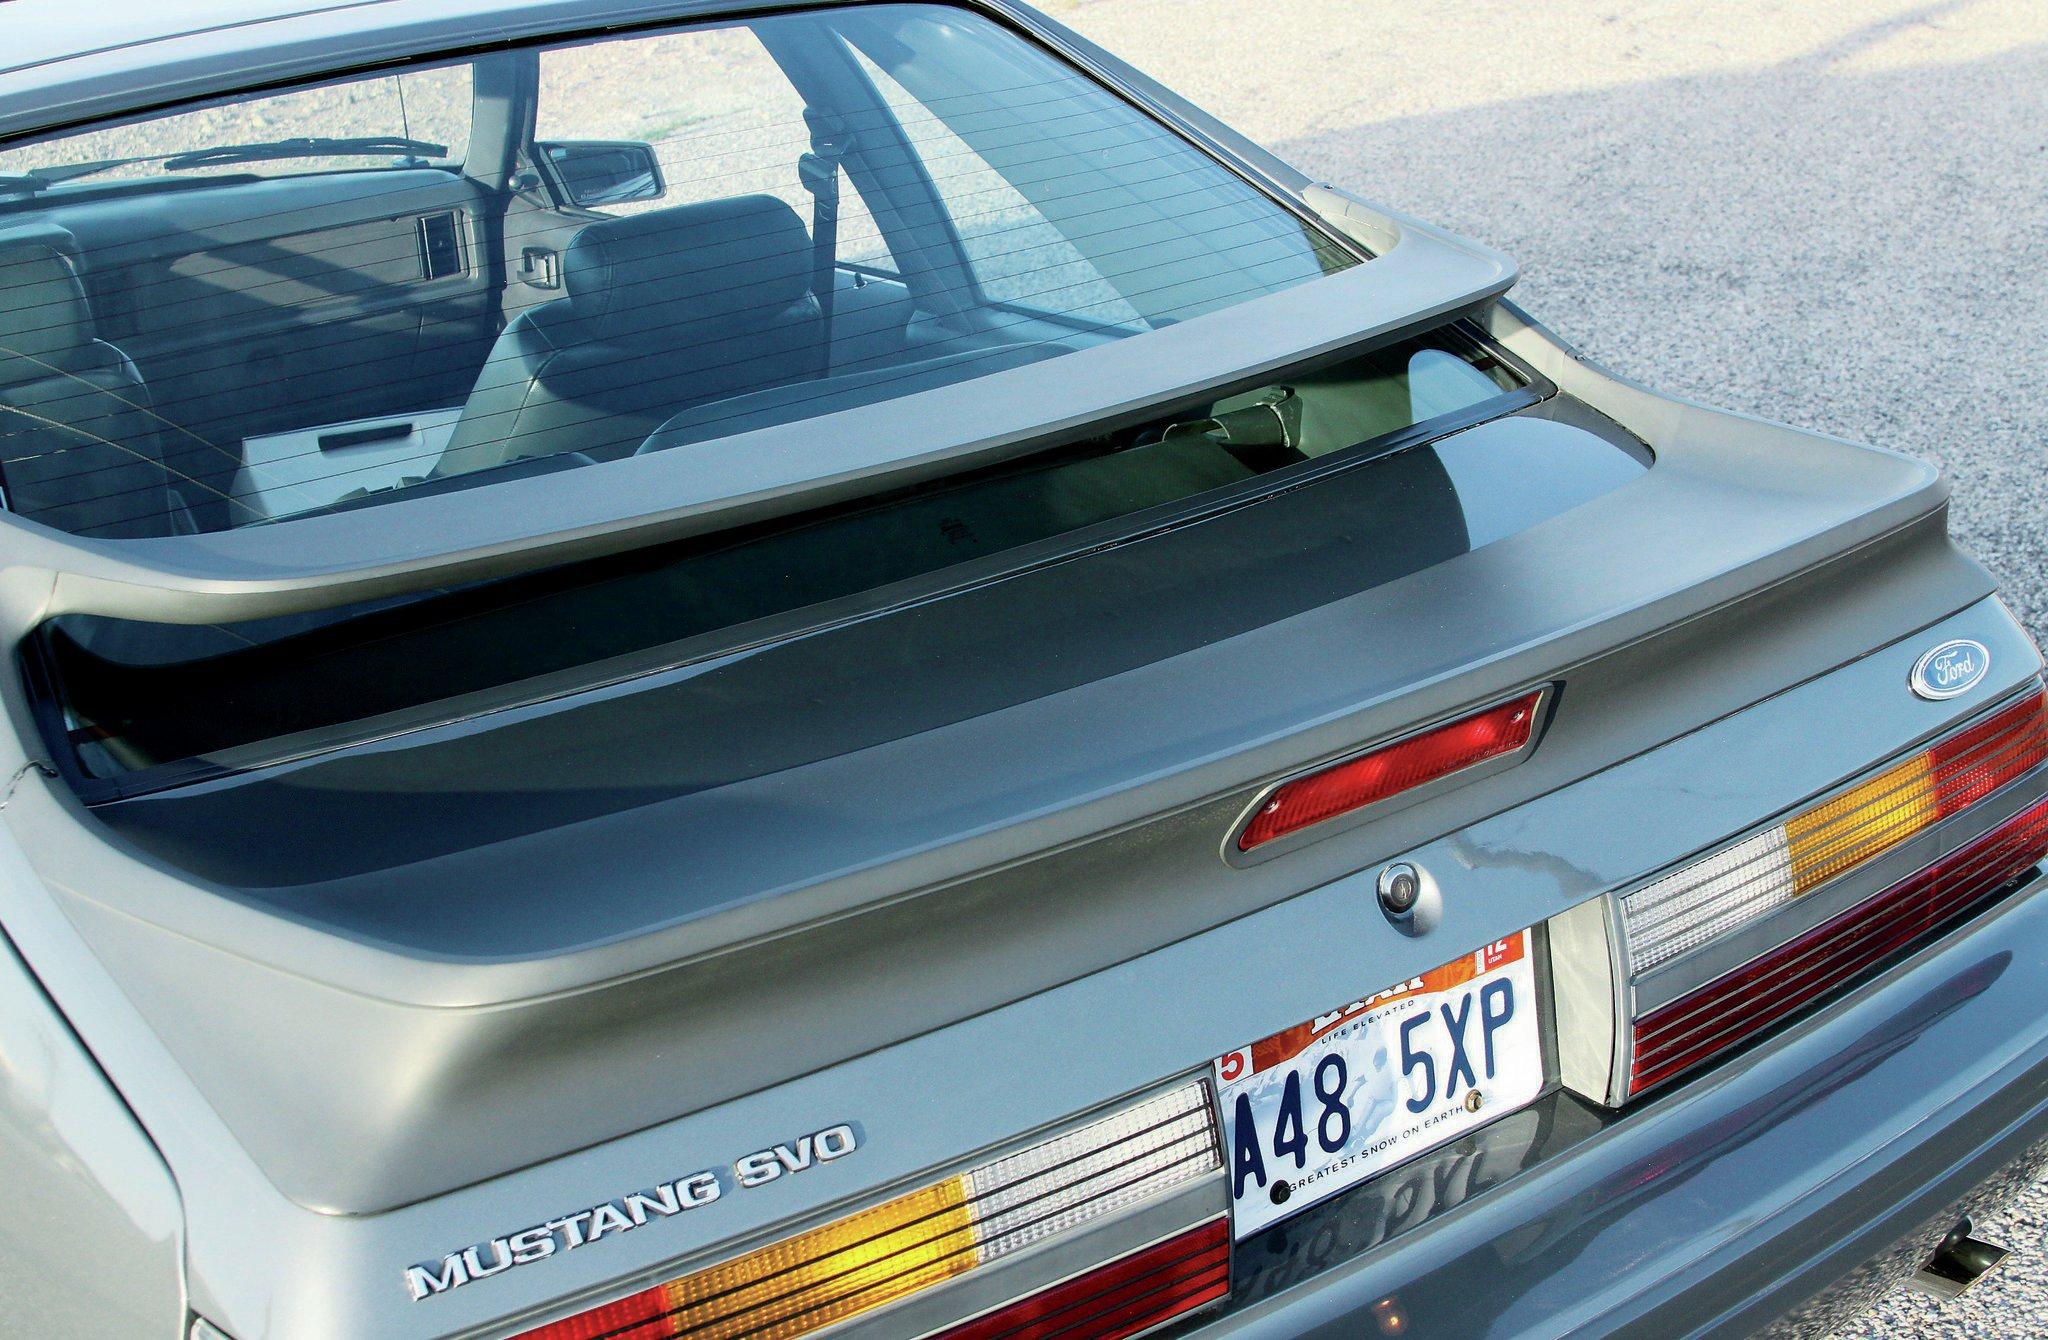 1986 Ford Mustang Bi Wing Design